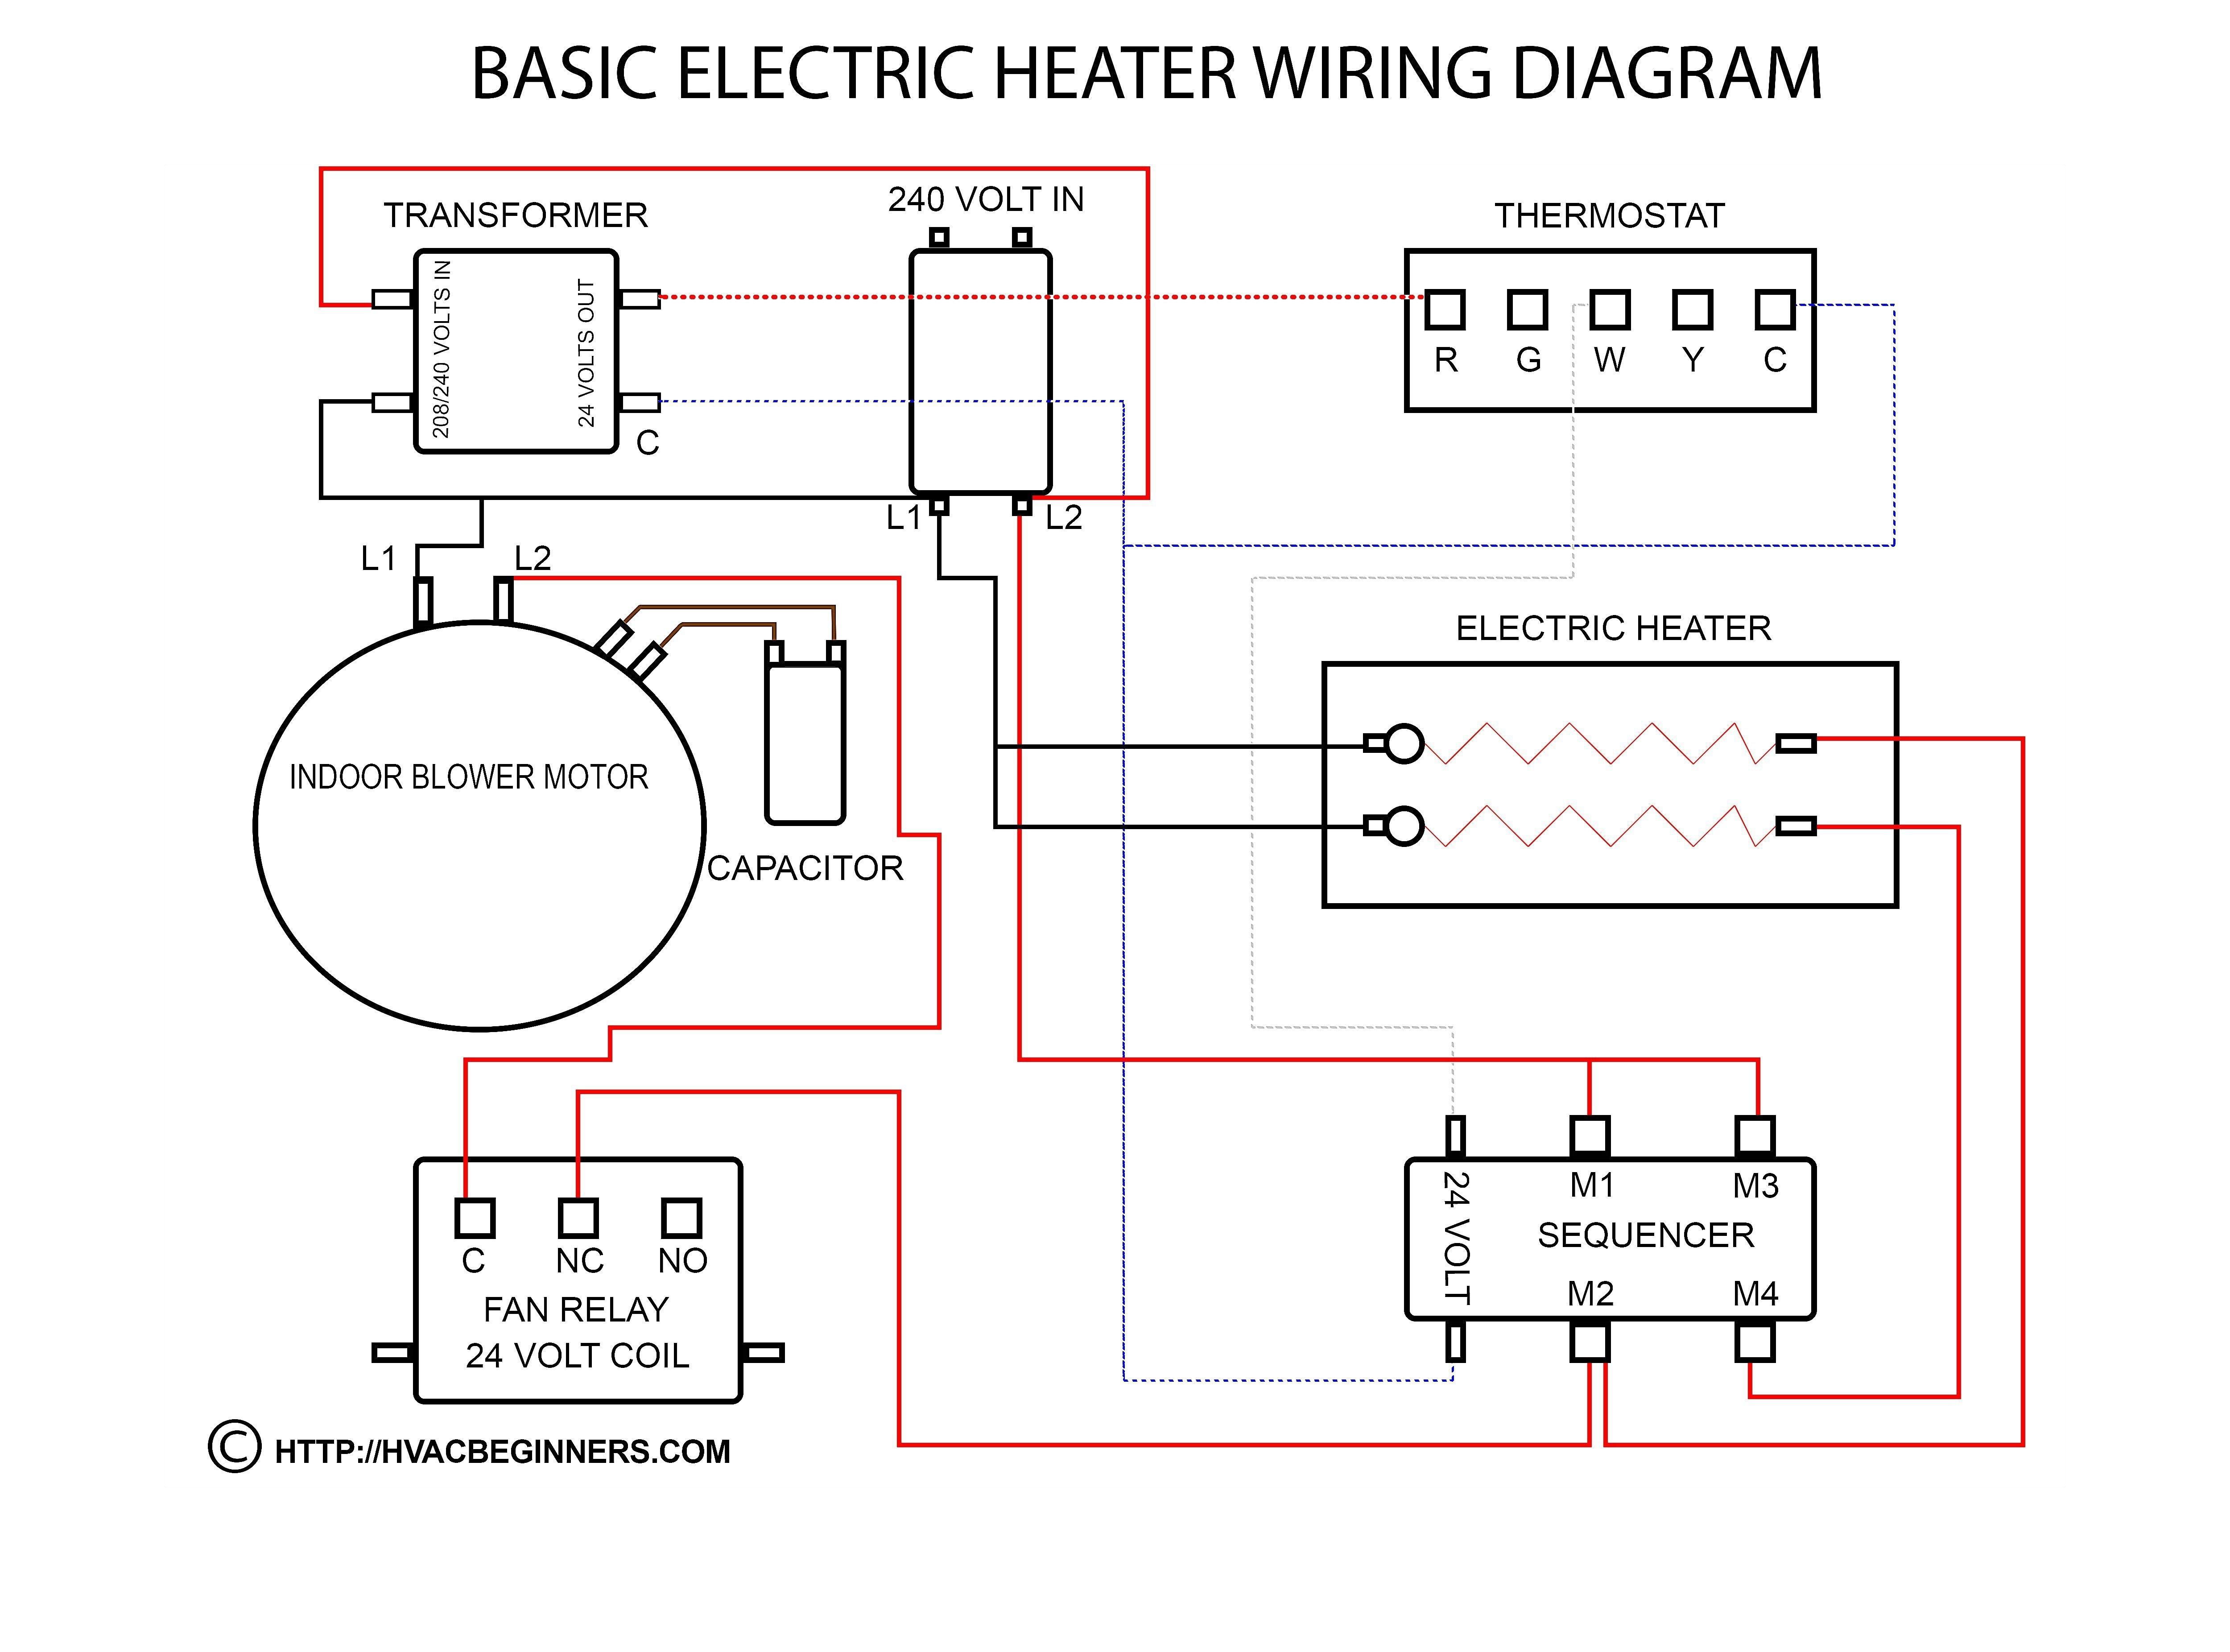 Terrific House Wiring Diagram Examples Pdf Unique House Wiring Circuits Pdf Wiring Cloud Lukepaidewilluminateatxorg